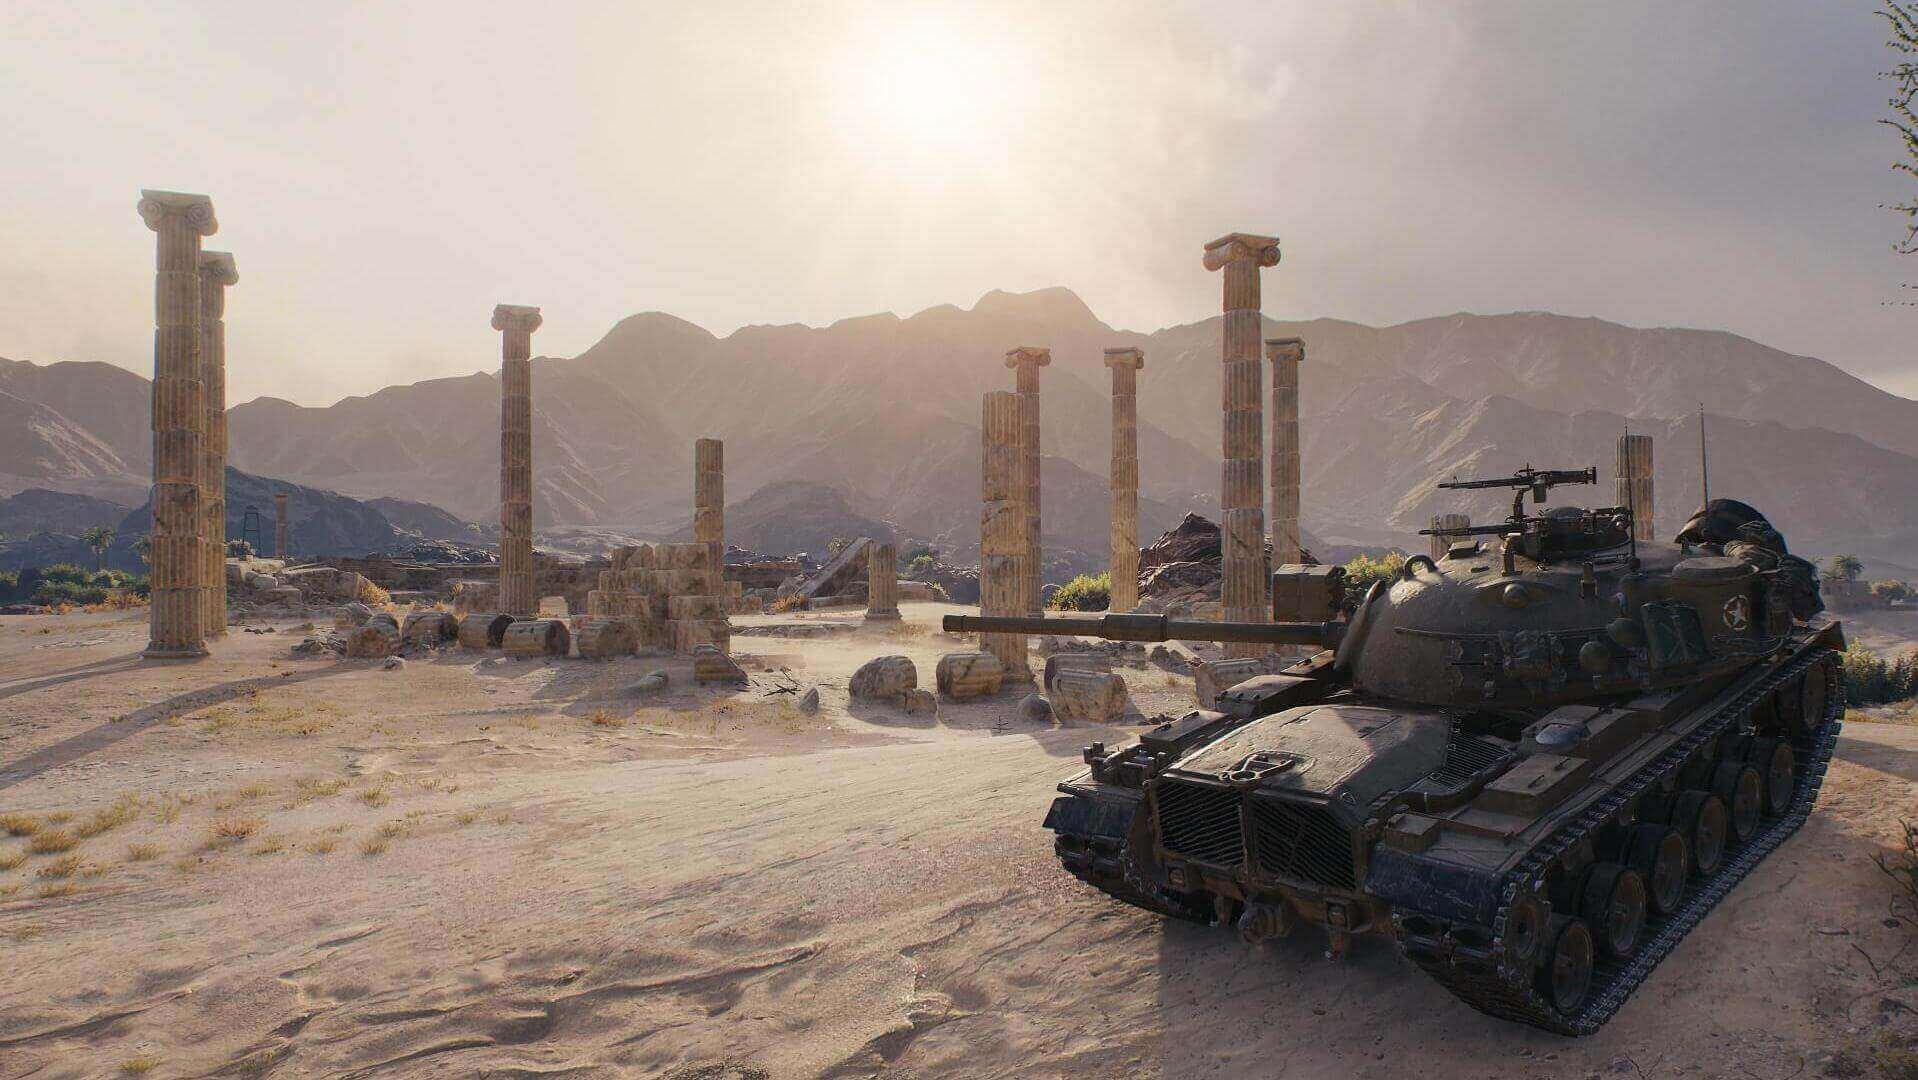 world of tanks free download utorrent